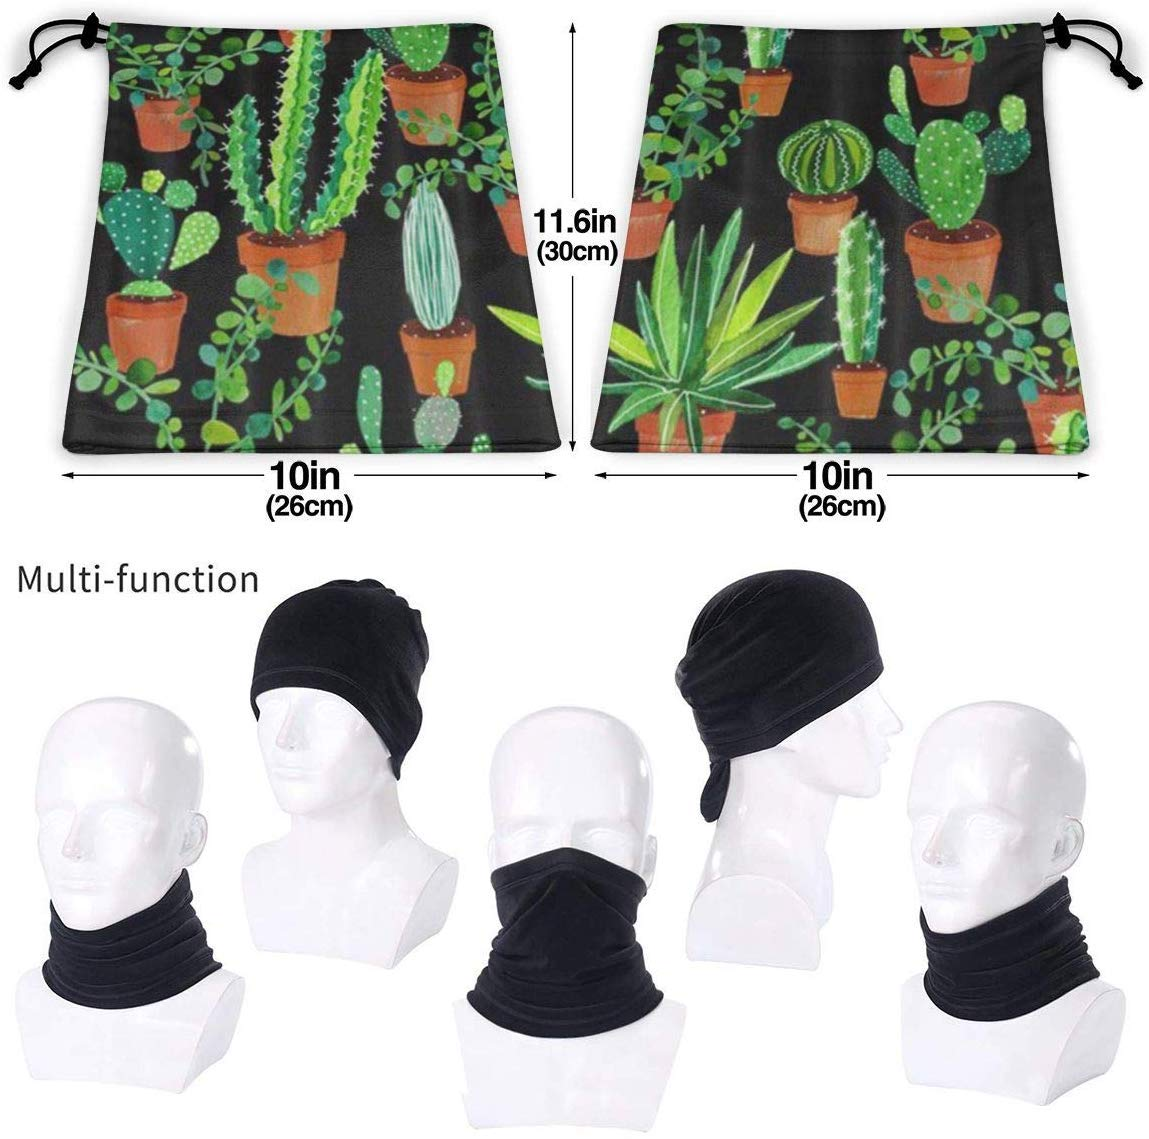 Kaktus Cactus Xarchy Maschera facciale pi/ù Calda per Scaldacollo in Pile Inverno allaperto